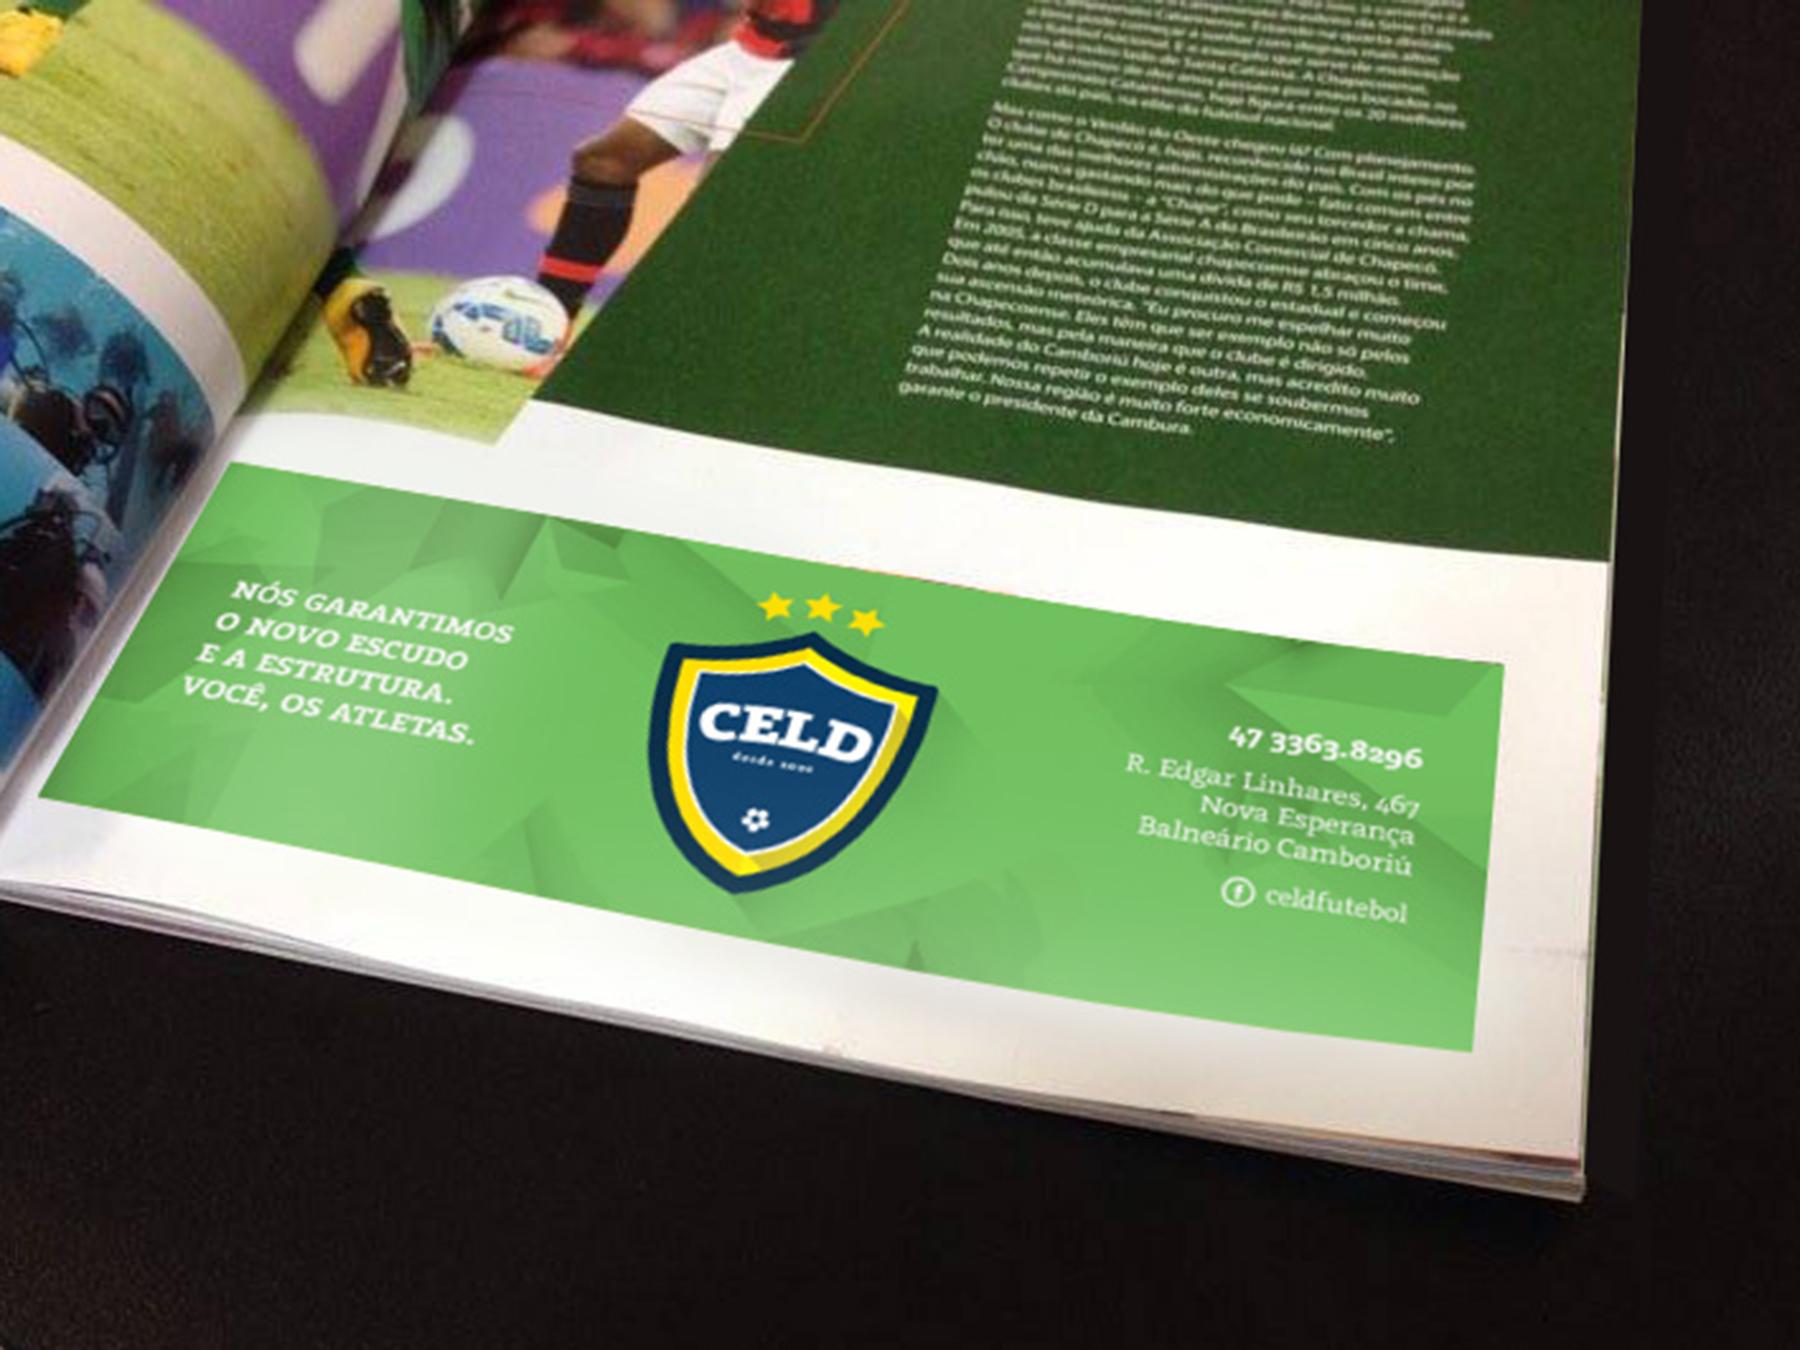 Inteligencia Marketing - CELD – NOVA IDENTIDADE - 1436-15-CELD-Anencio-revista-Acibalc-mockup